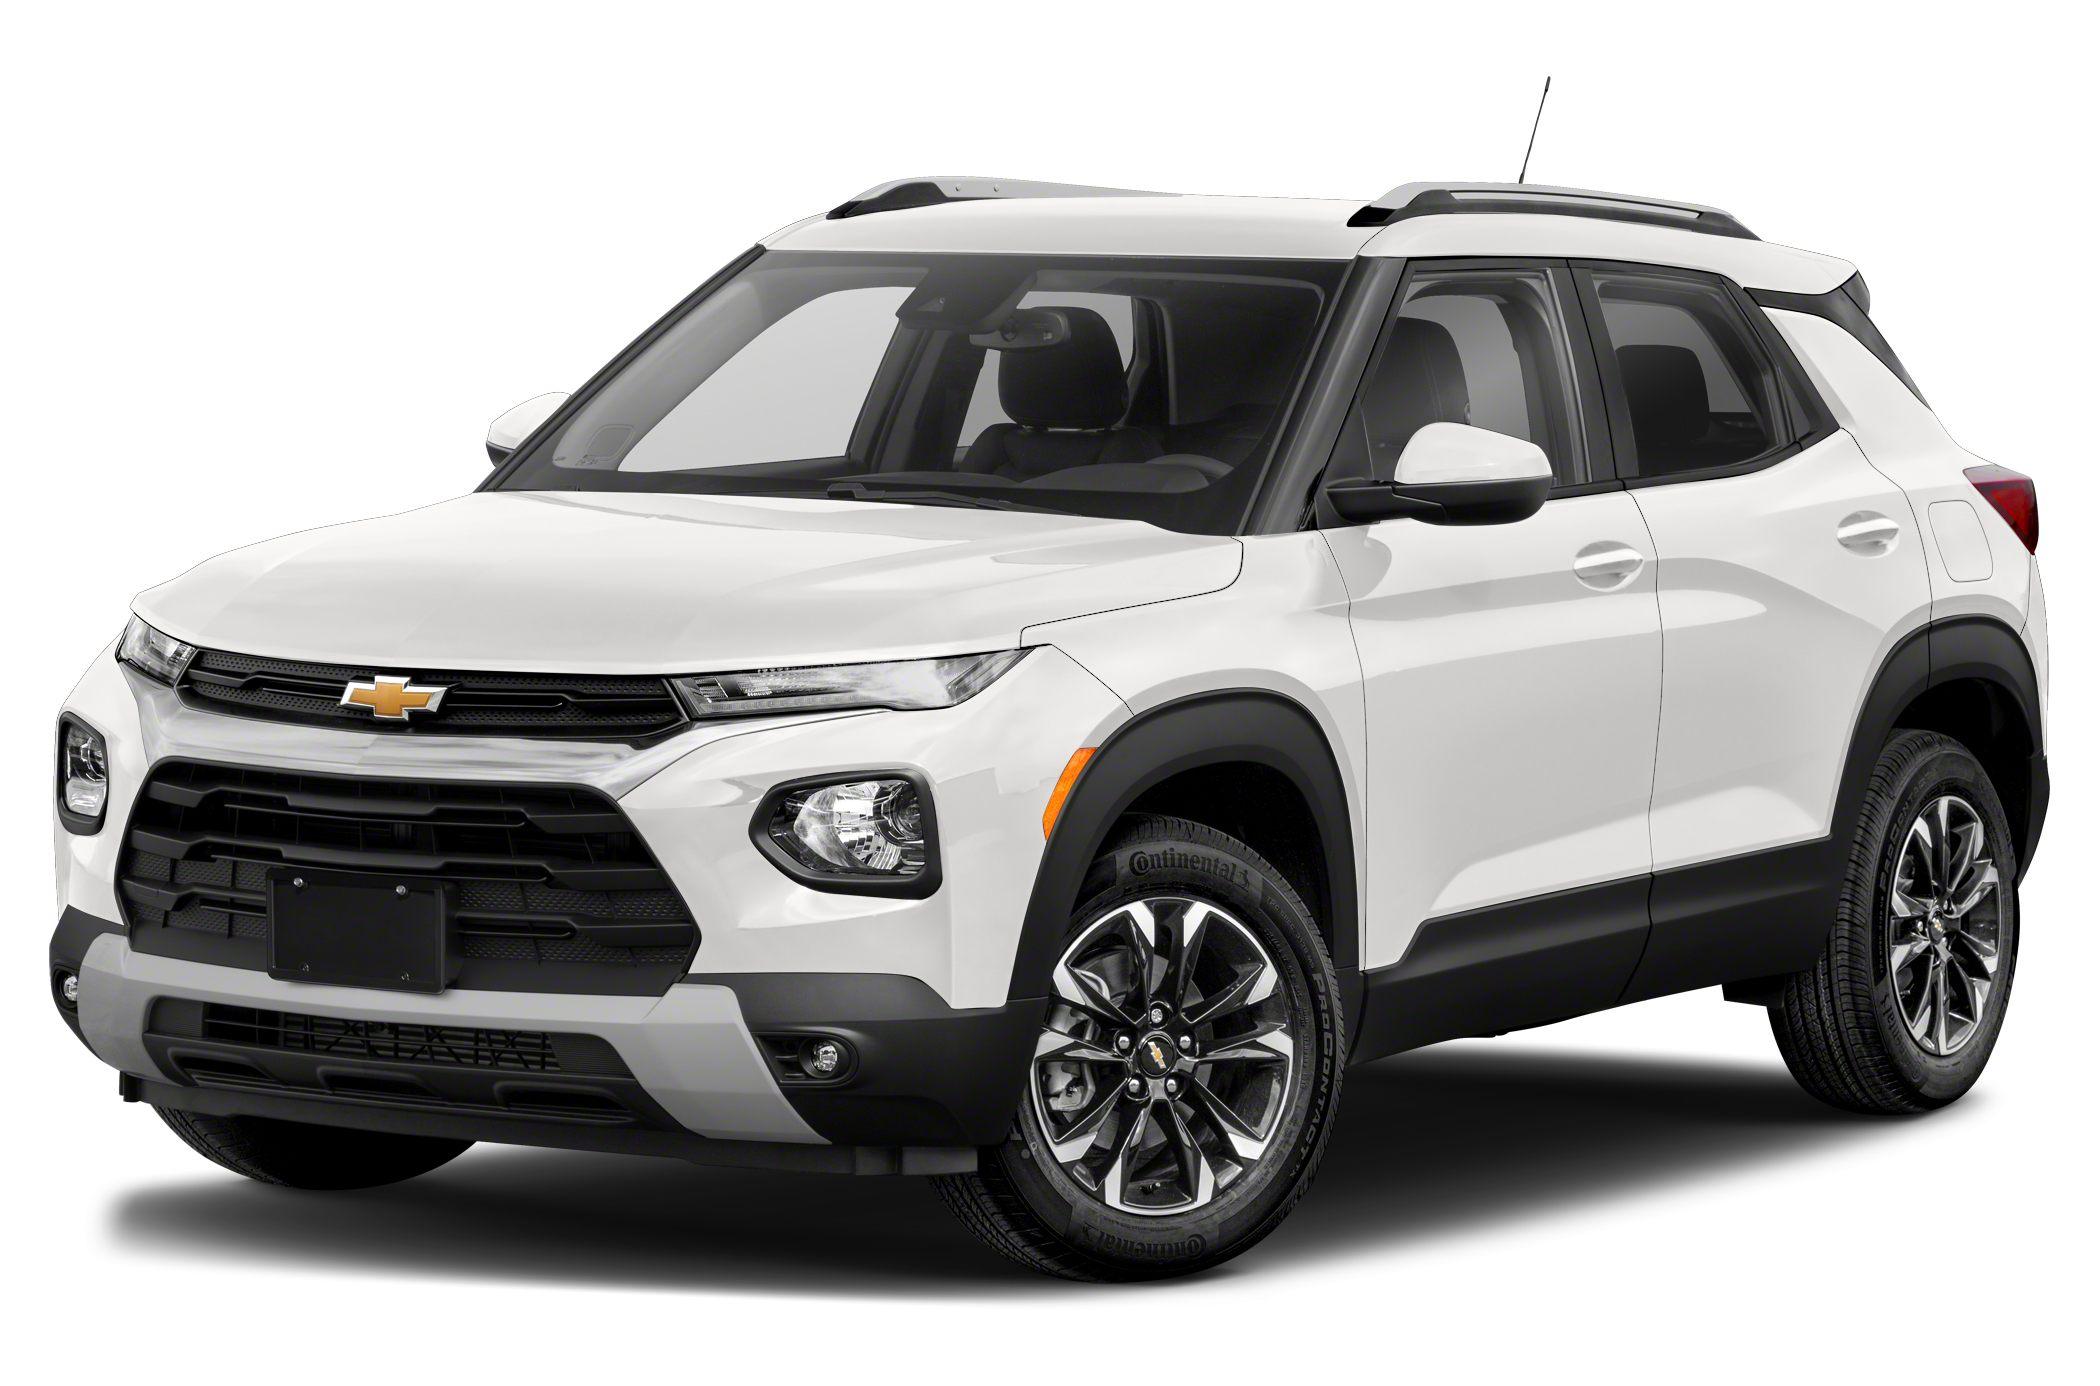 2021 Chevrolet Trailblazer Ls All Wheel Drive Specs And Prices